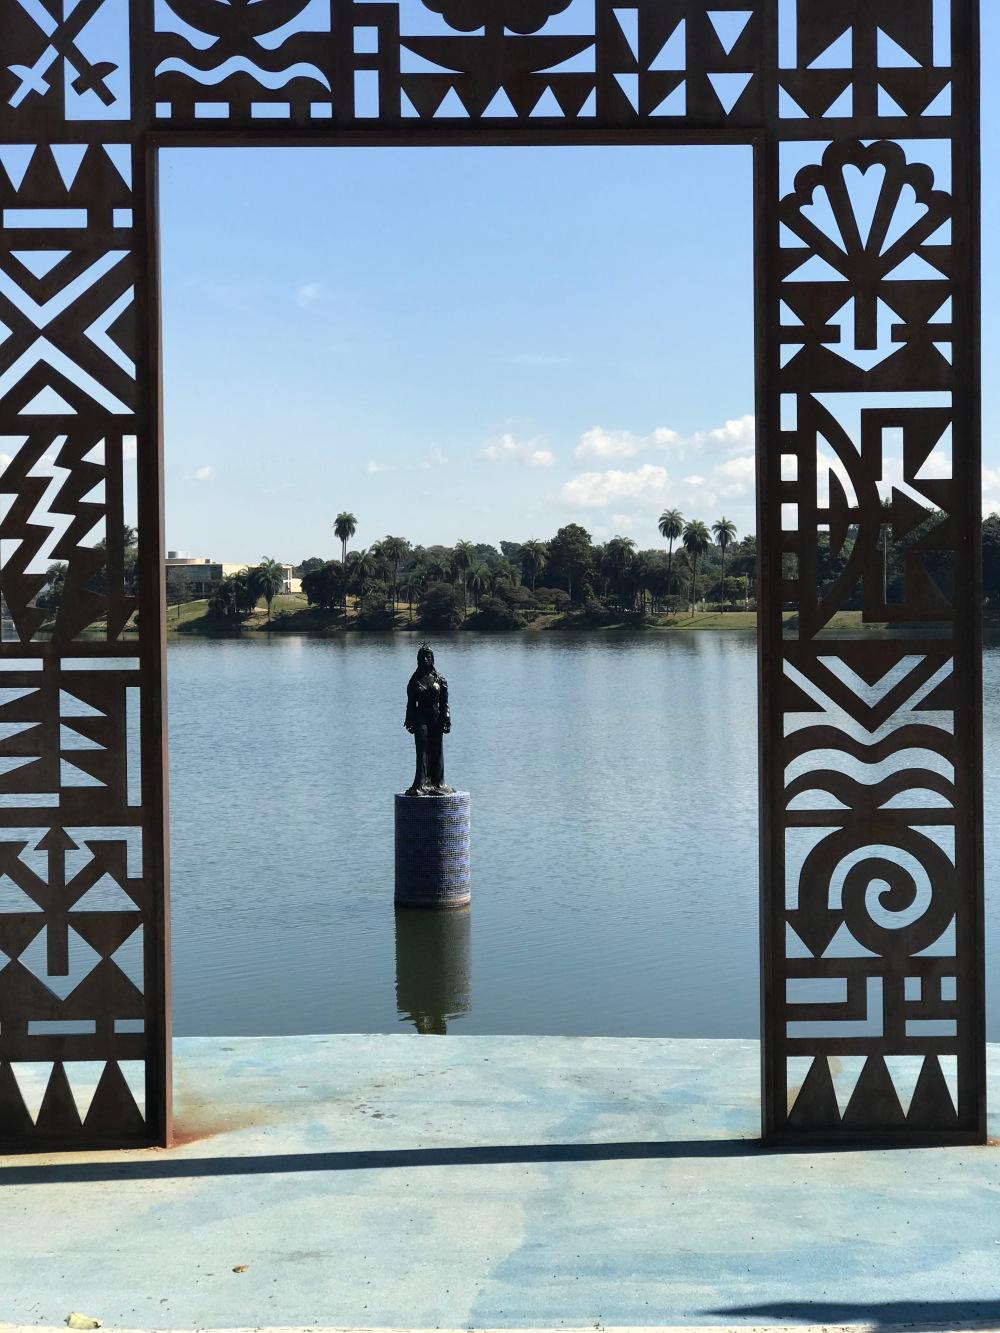 Imagem de Iemanjjá na Lagoa da Pampulha